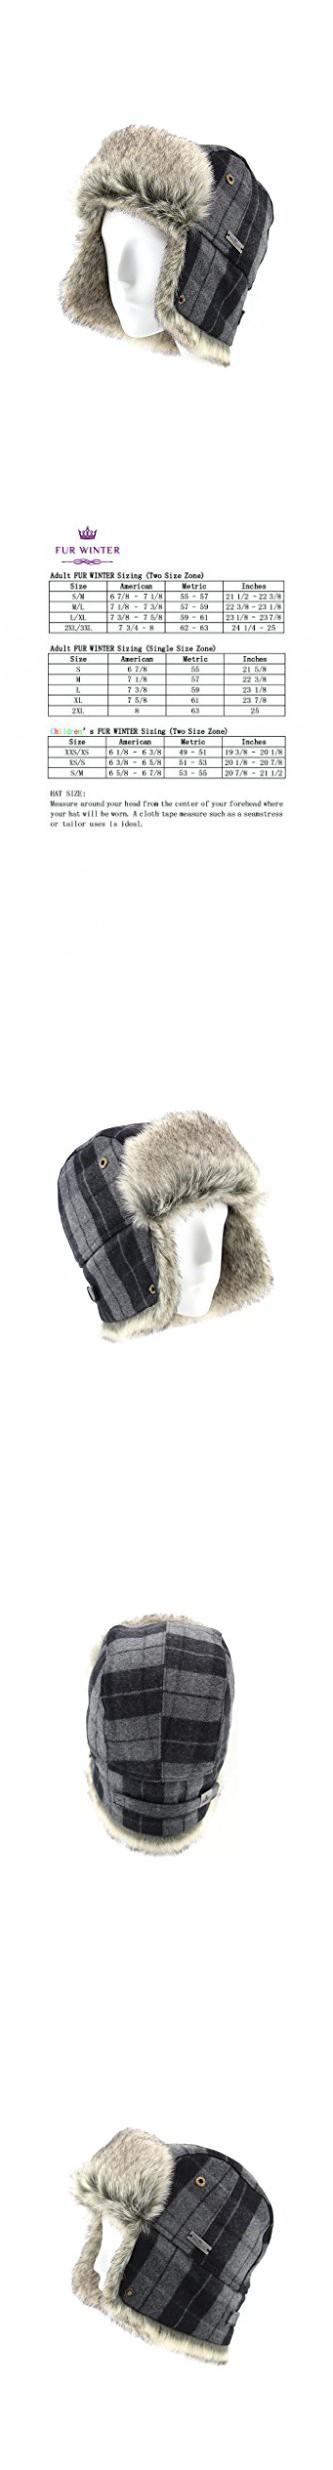 FUR WINTER Wool Blend Buffalo Check Faux Fur Aviator Bomber Trapper Hat BLK/GRY M/L